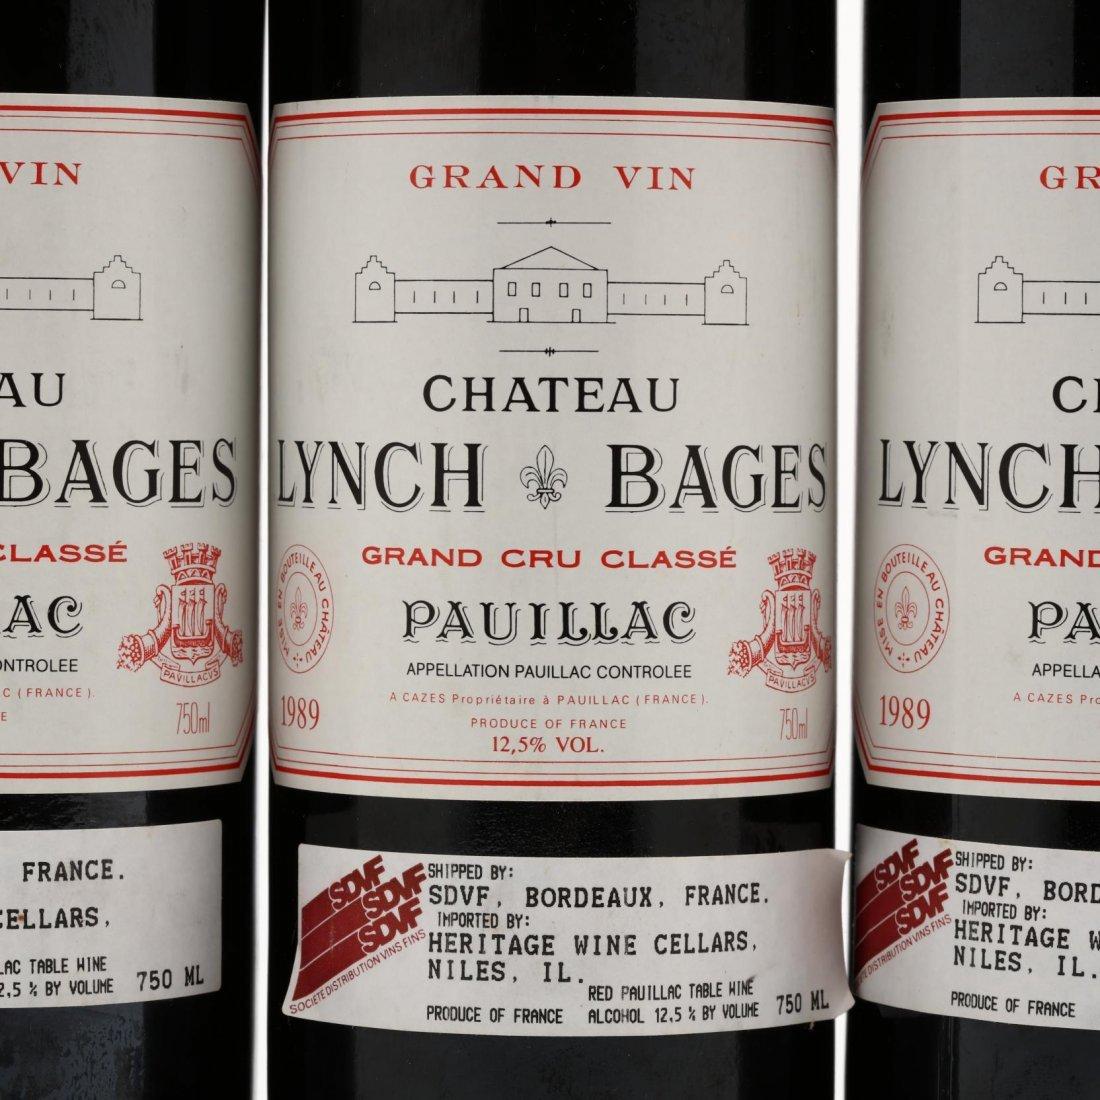 Chateau Lynch-Bages - Vintage 1989 - 2